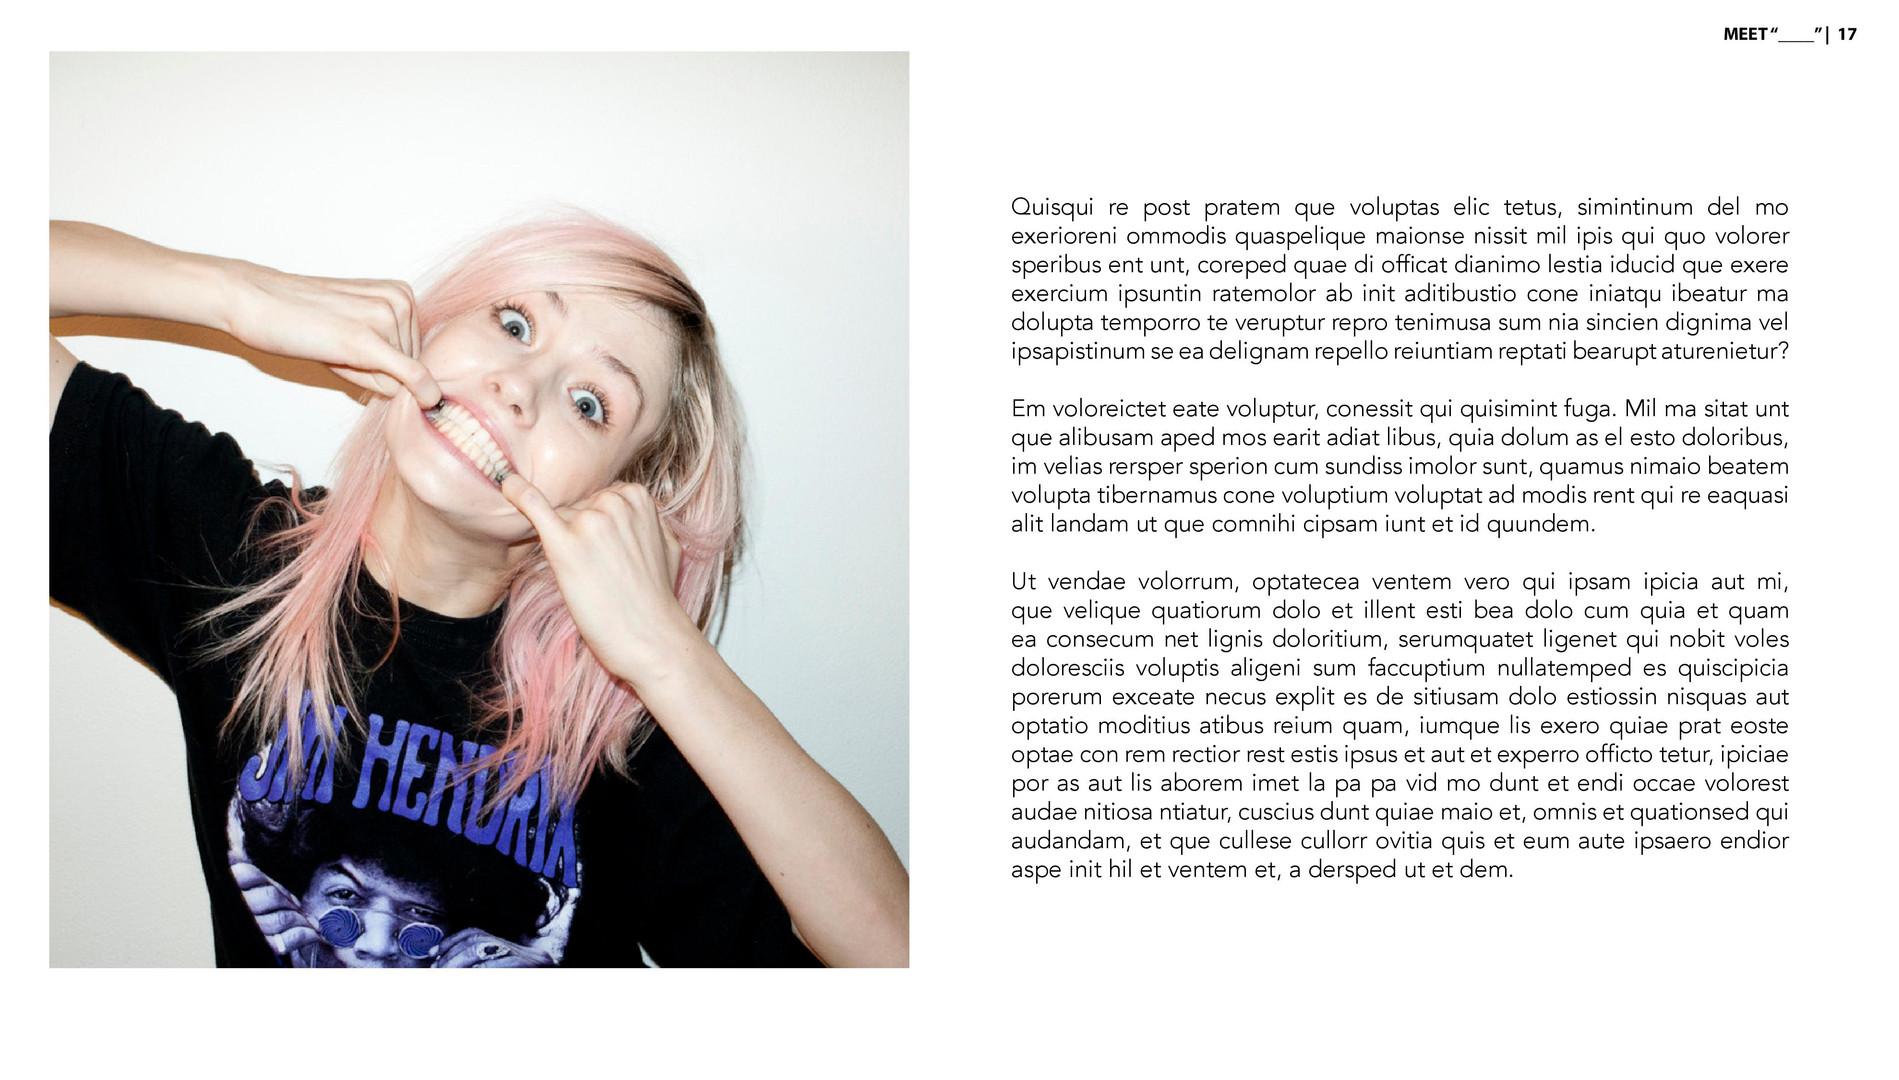 MEET LOREM IPSUM-page-017.jpg